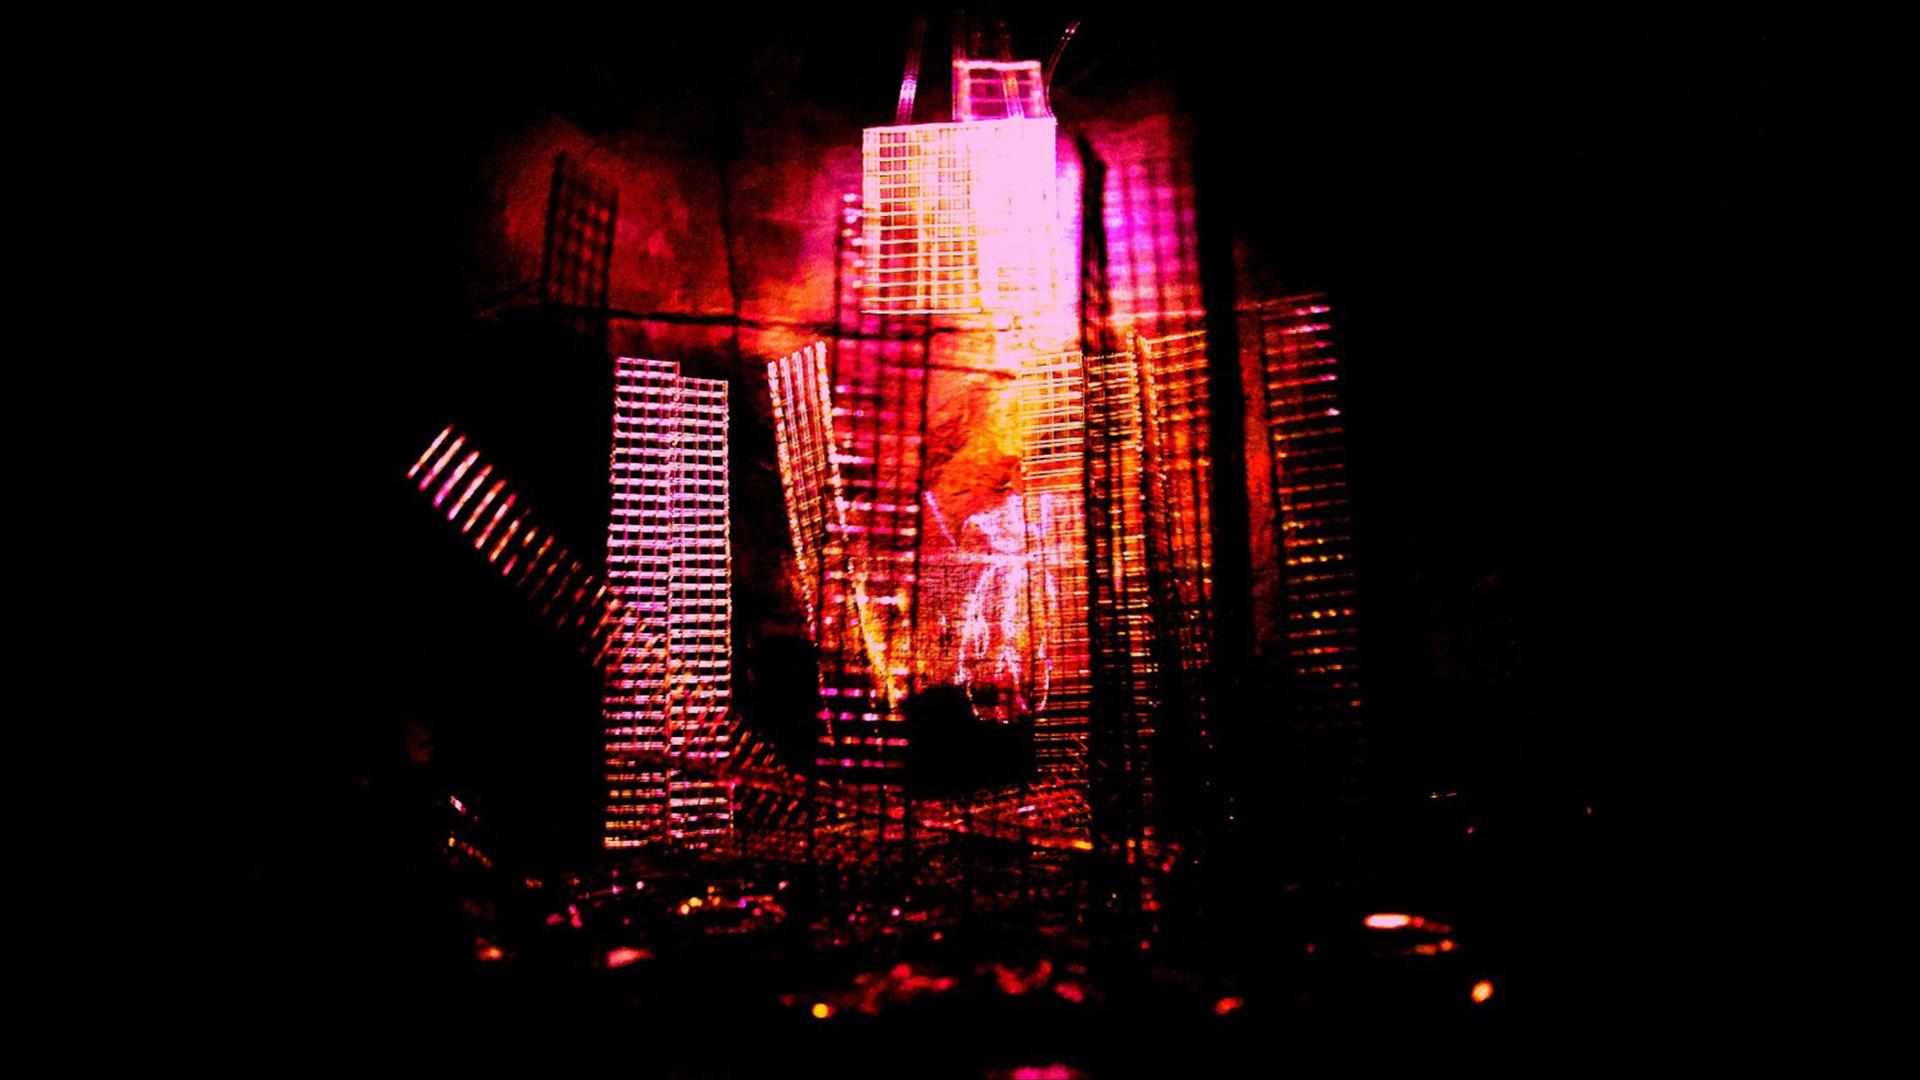 Ketty Denaro, Love-Lies Bleeding, 2012